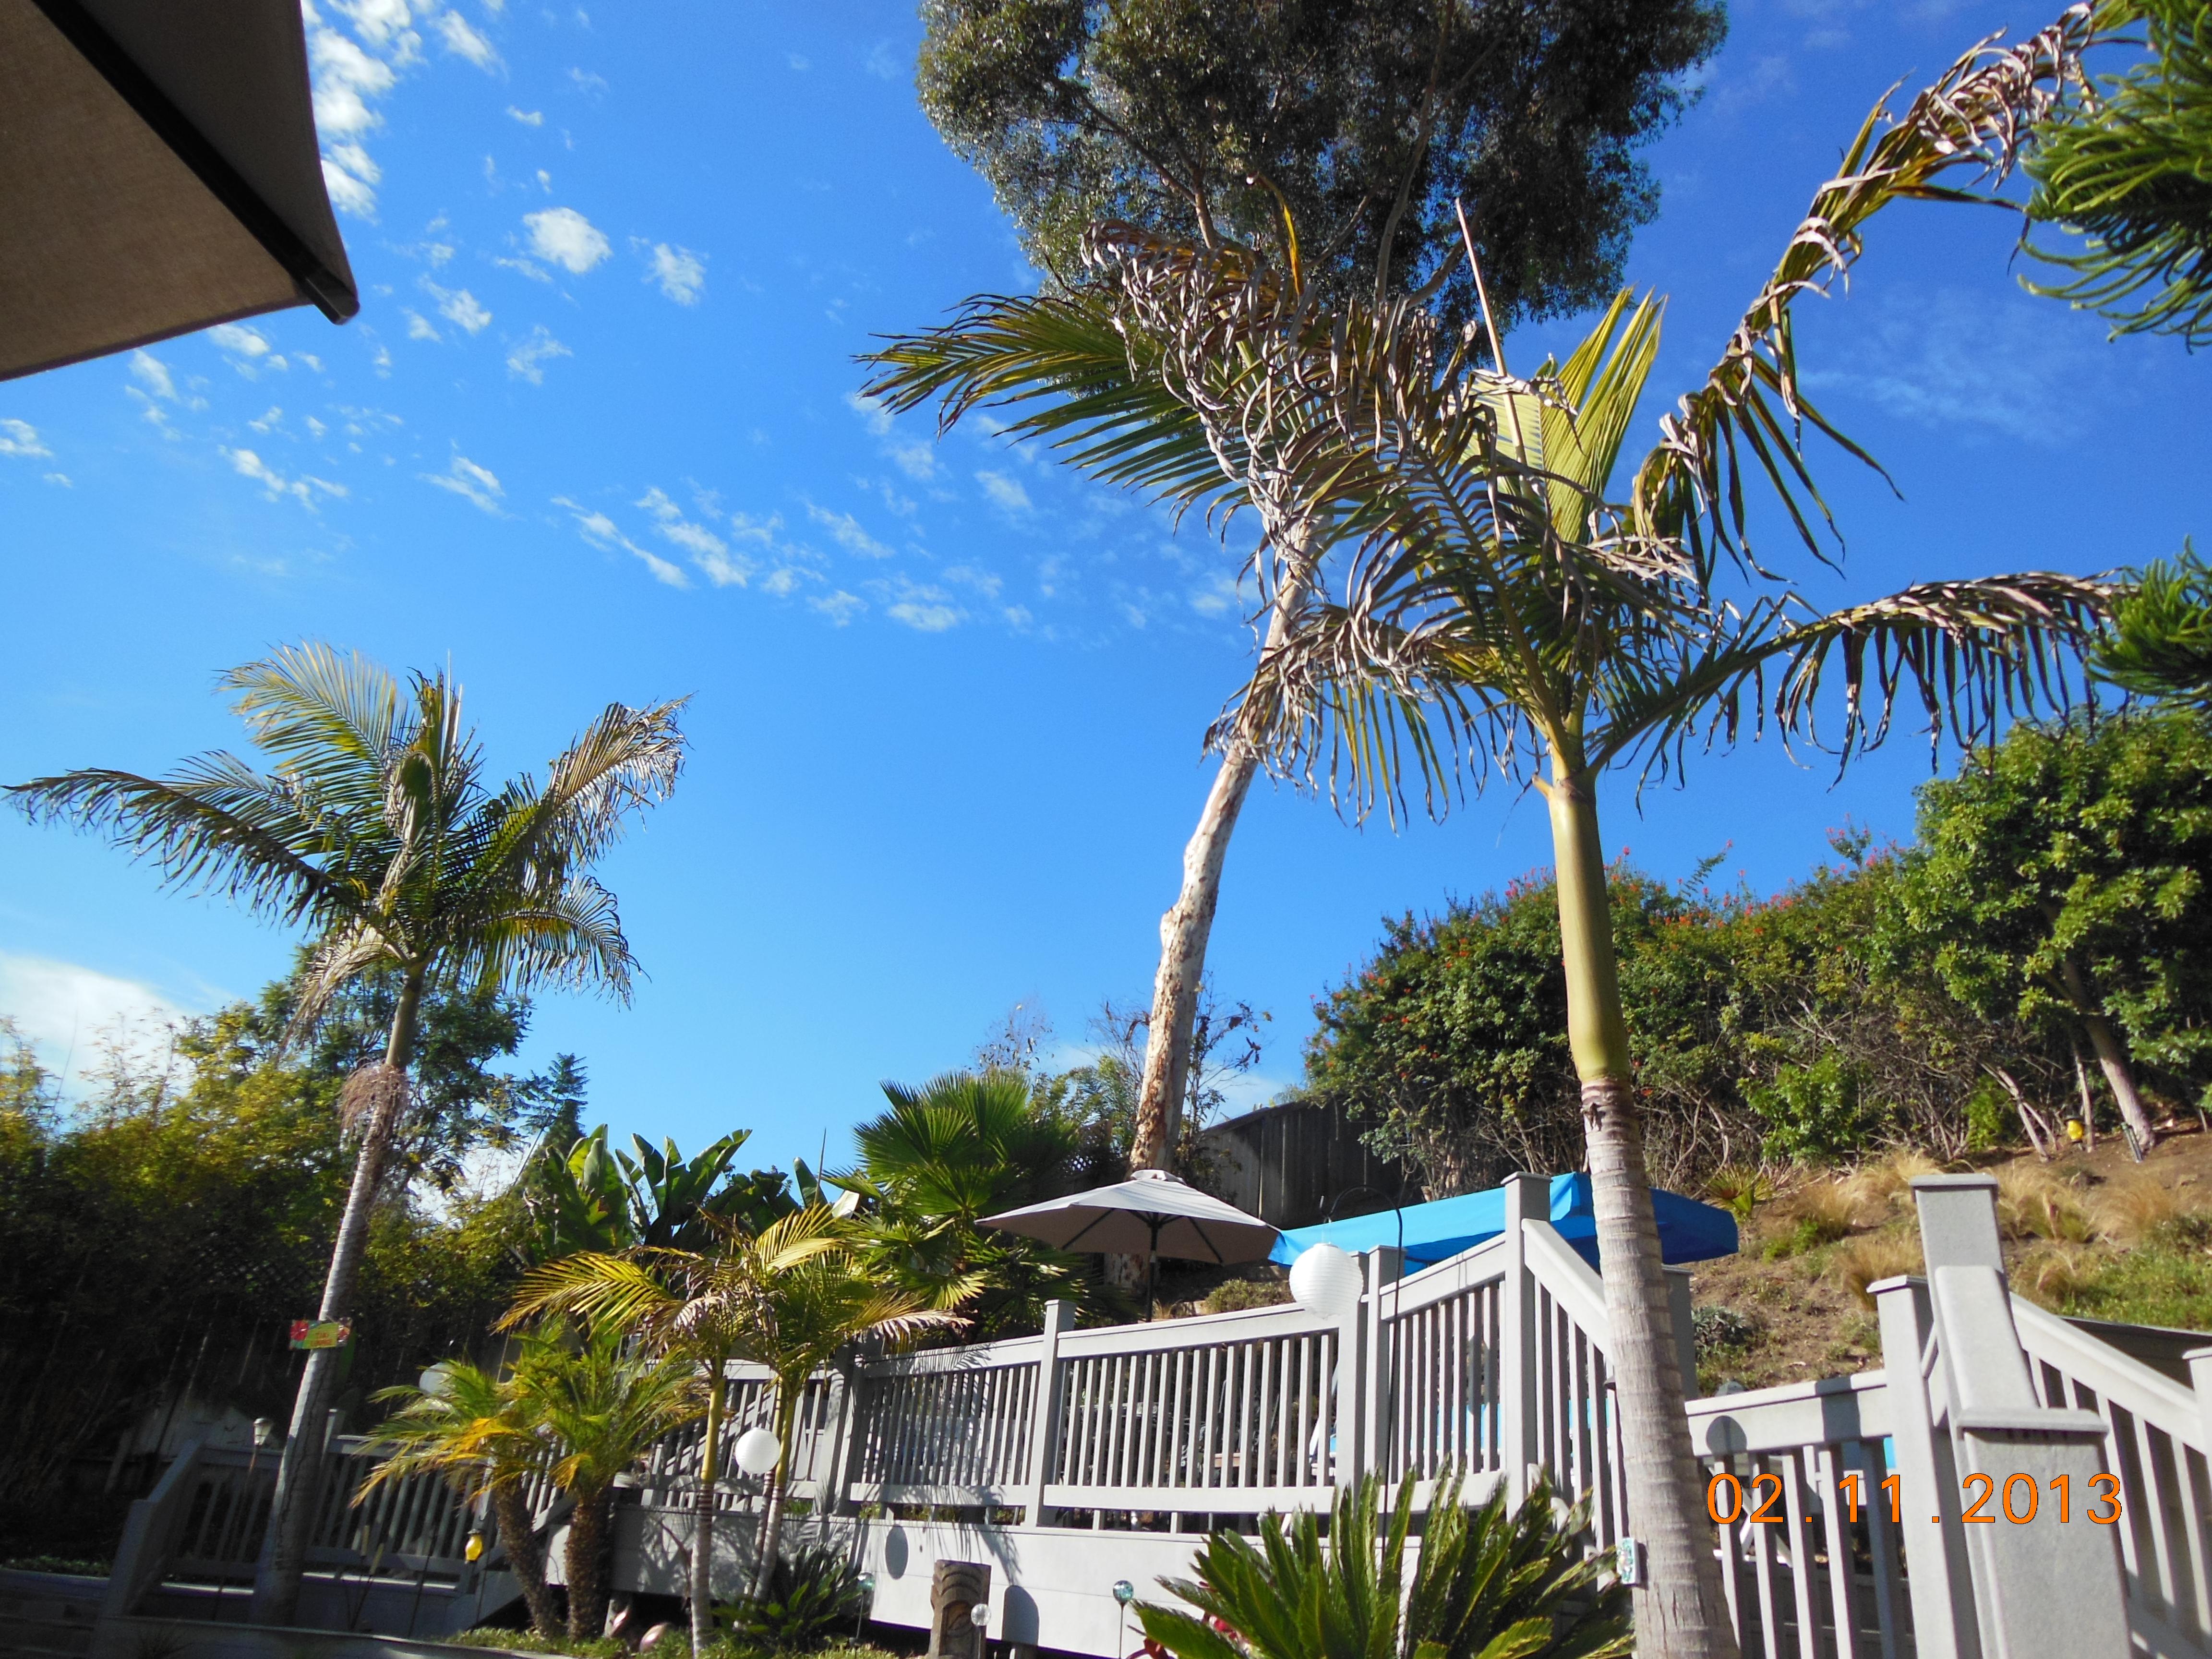 Tropical Backyard Paradise! Bring the pets. Pool, deck, spa, garden ...